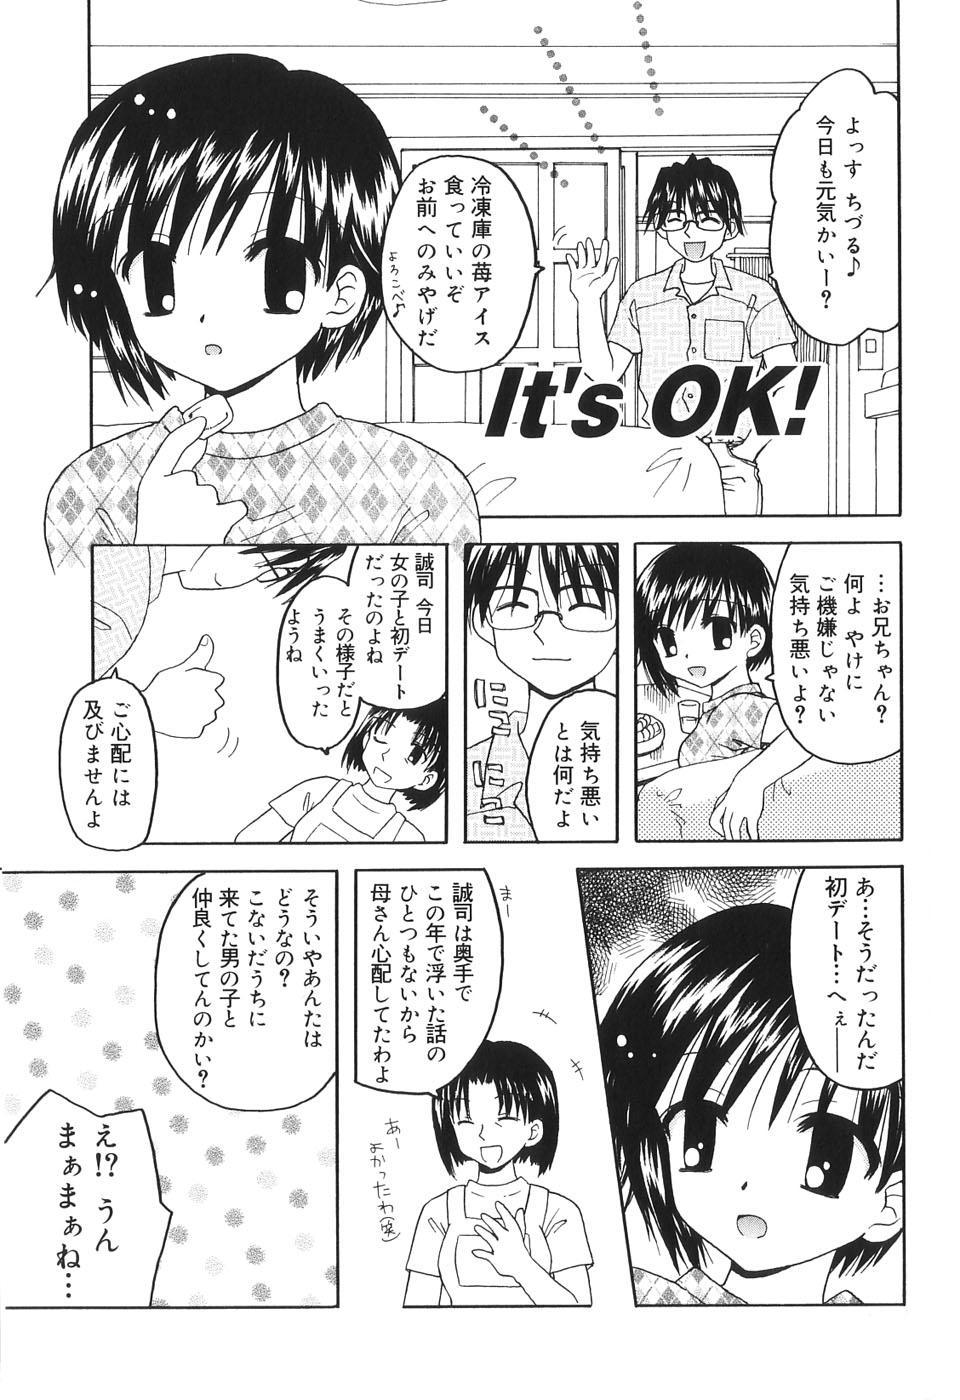 Musoubana 109